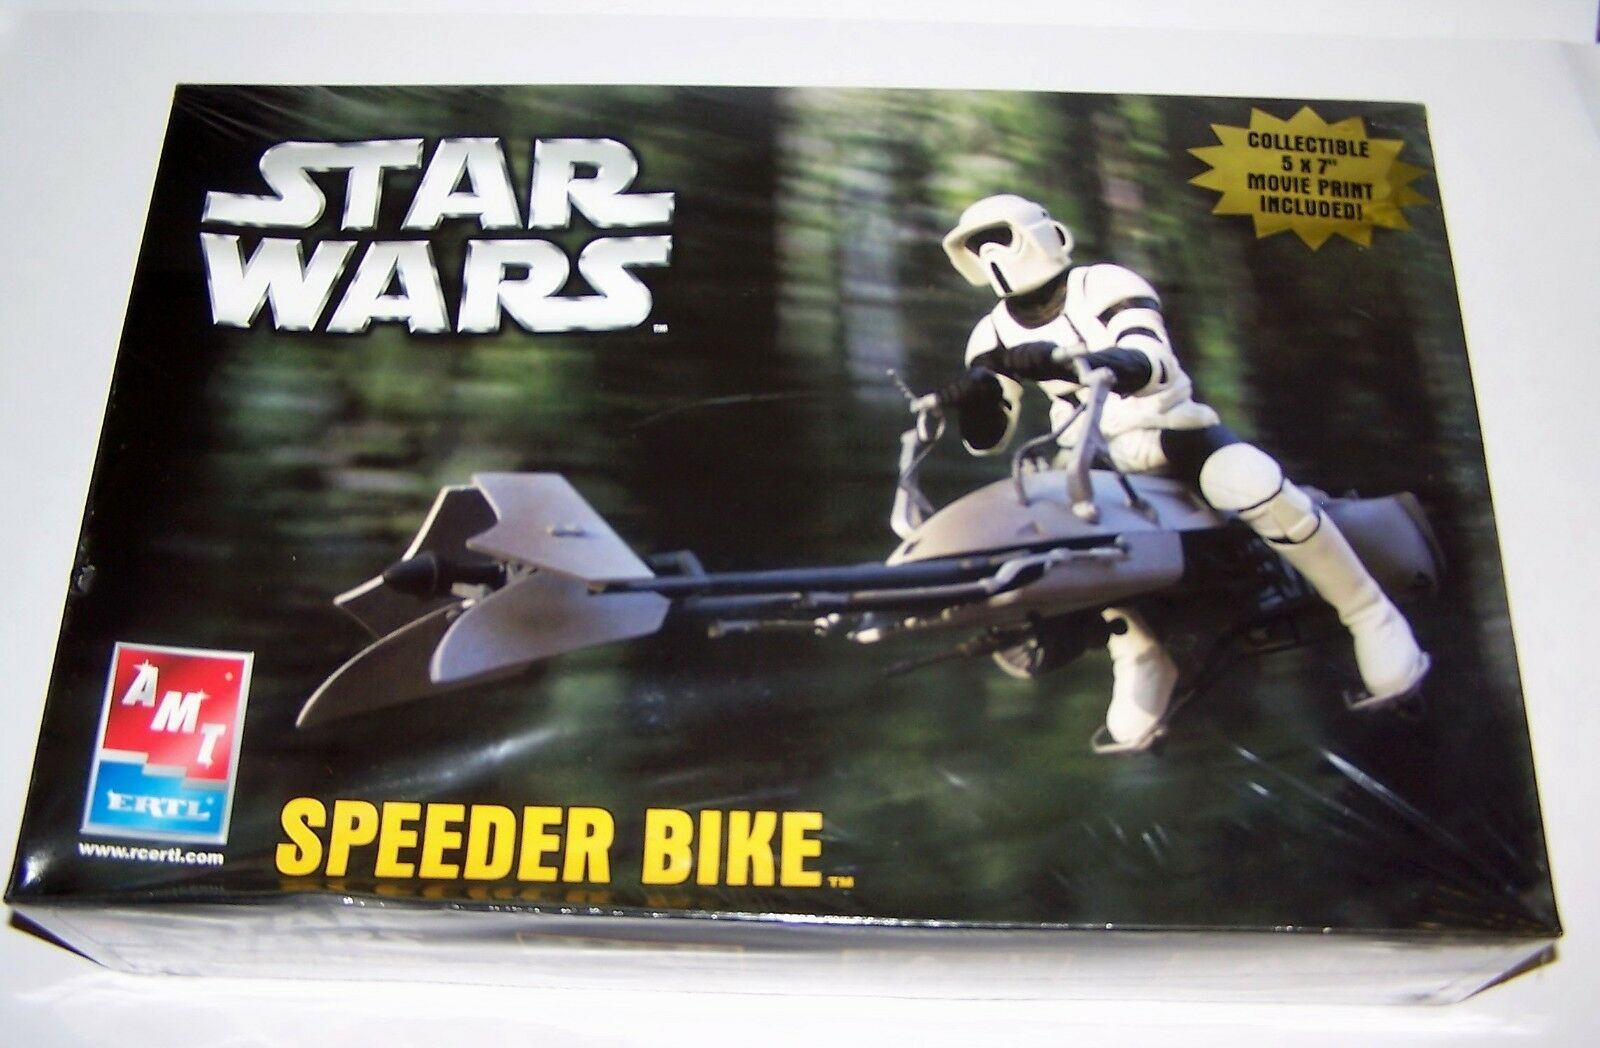 Star Wars Speeder Bike Model Kit 5x7 Movie Print Included NIB Sealed 2005